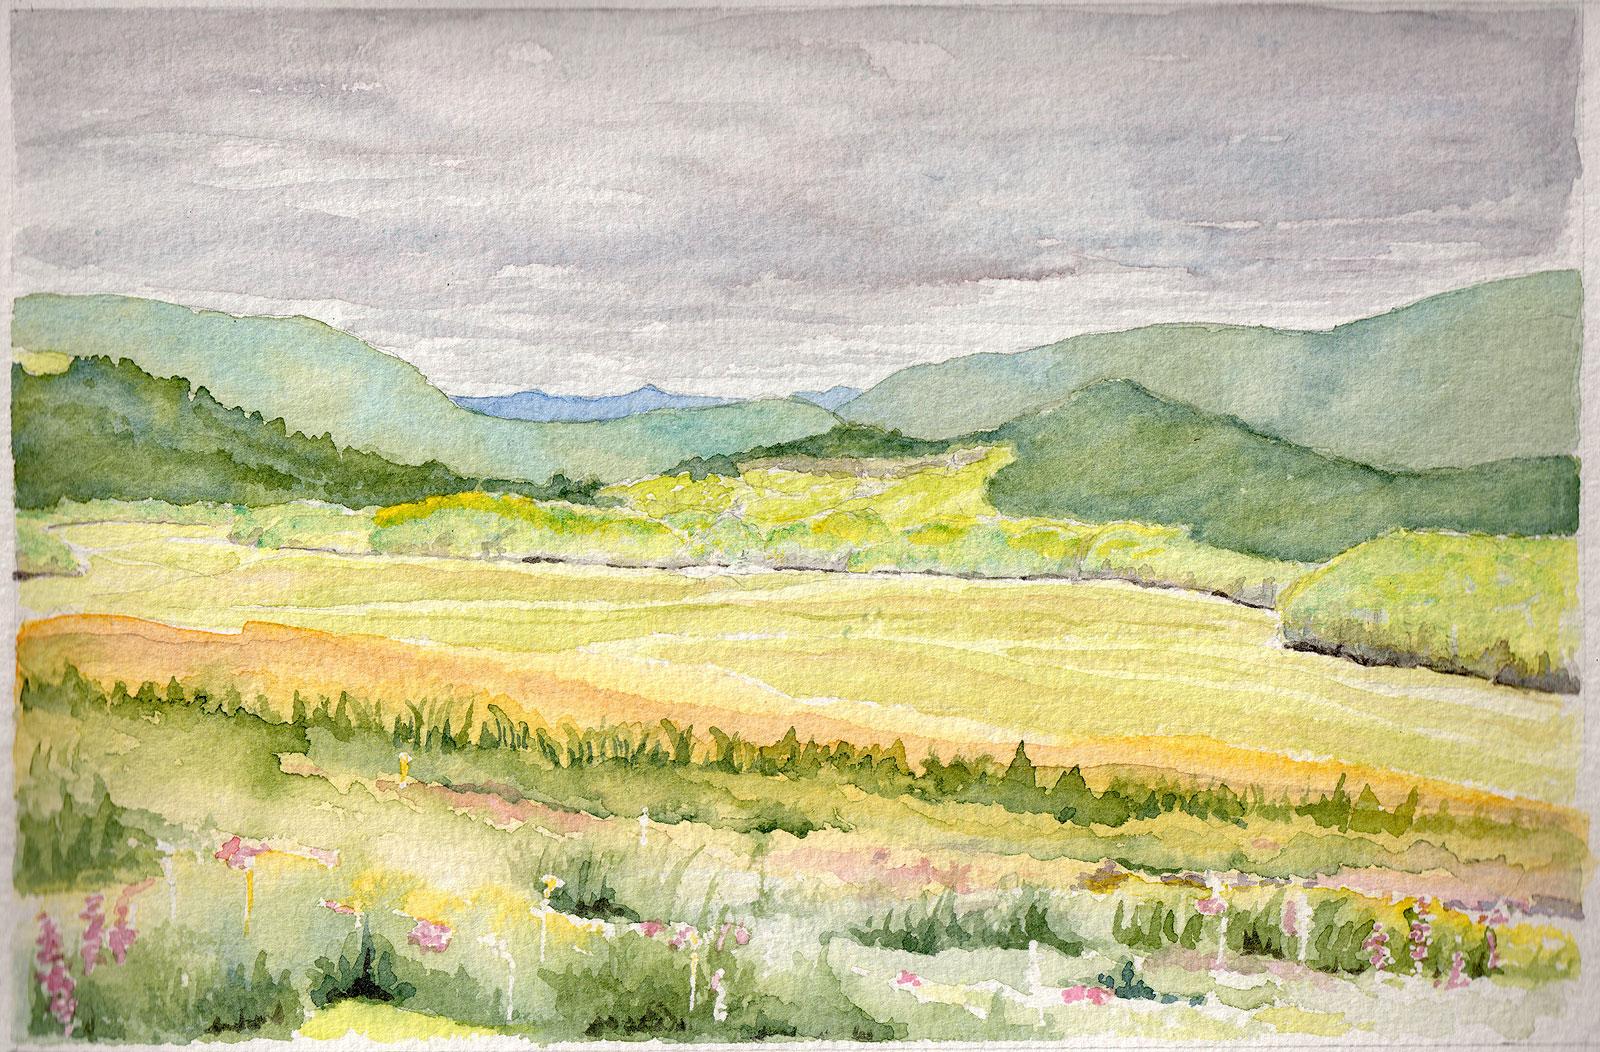 01. Grasslands View